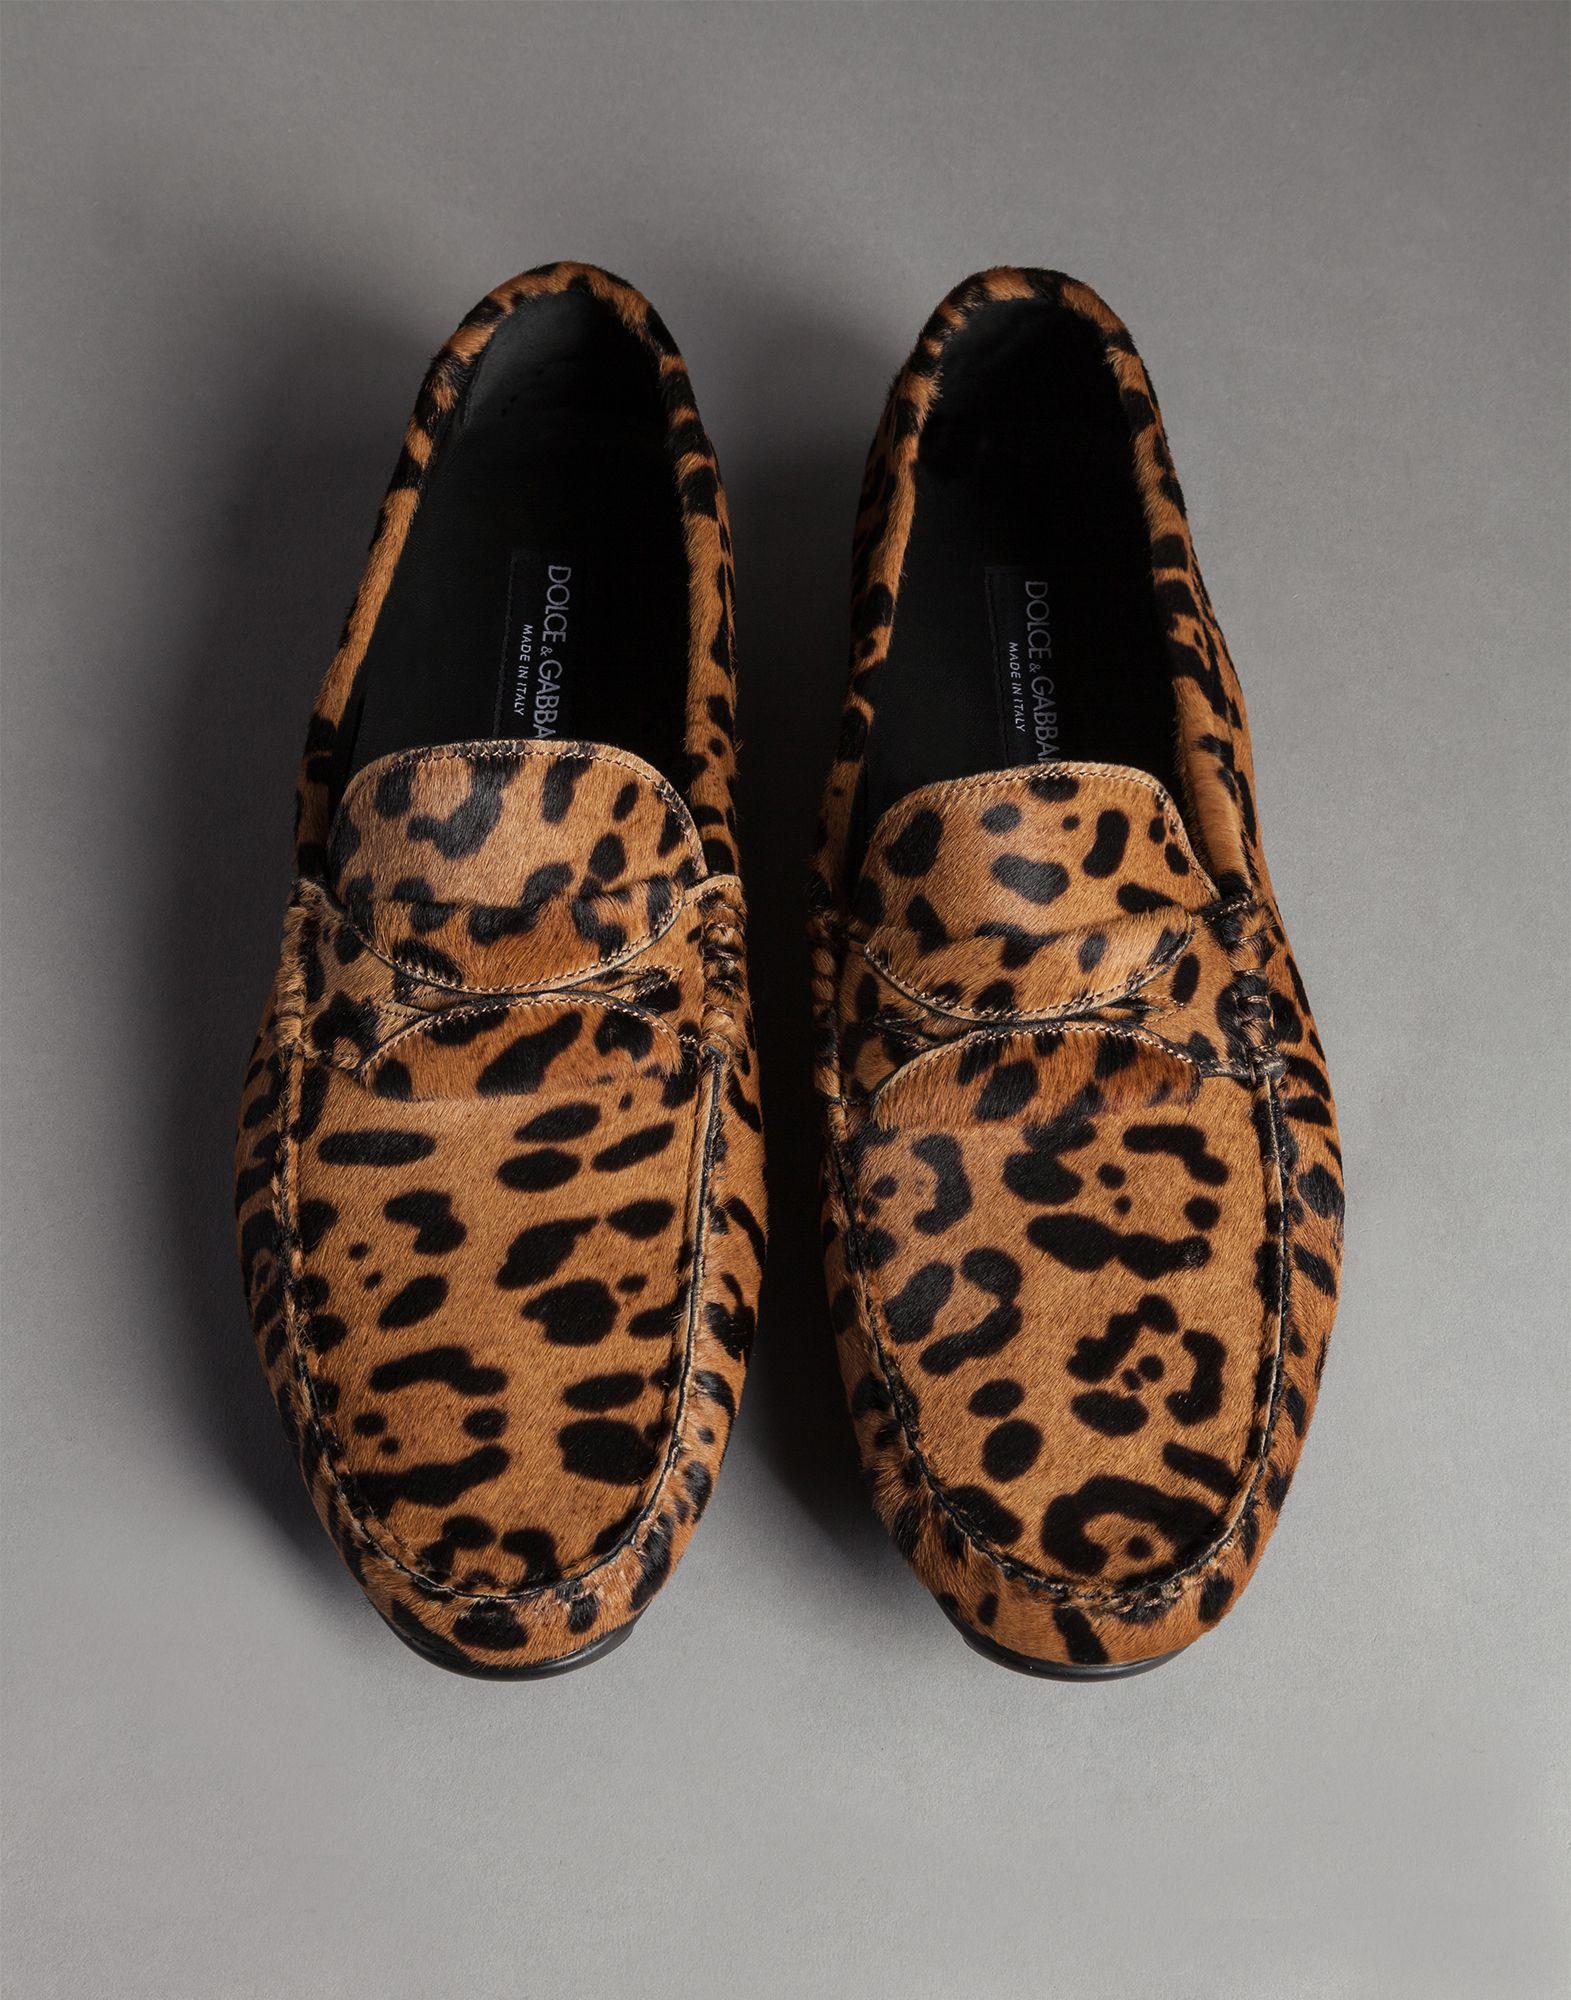 c08fac9550f Lyst - Dolce   Gabbana Natural Leopard Print Pony Ragusa Driving ...